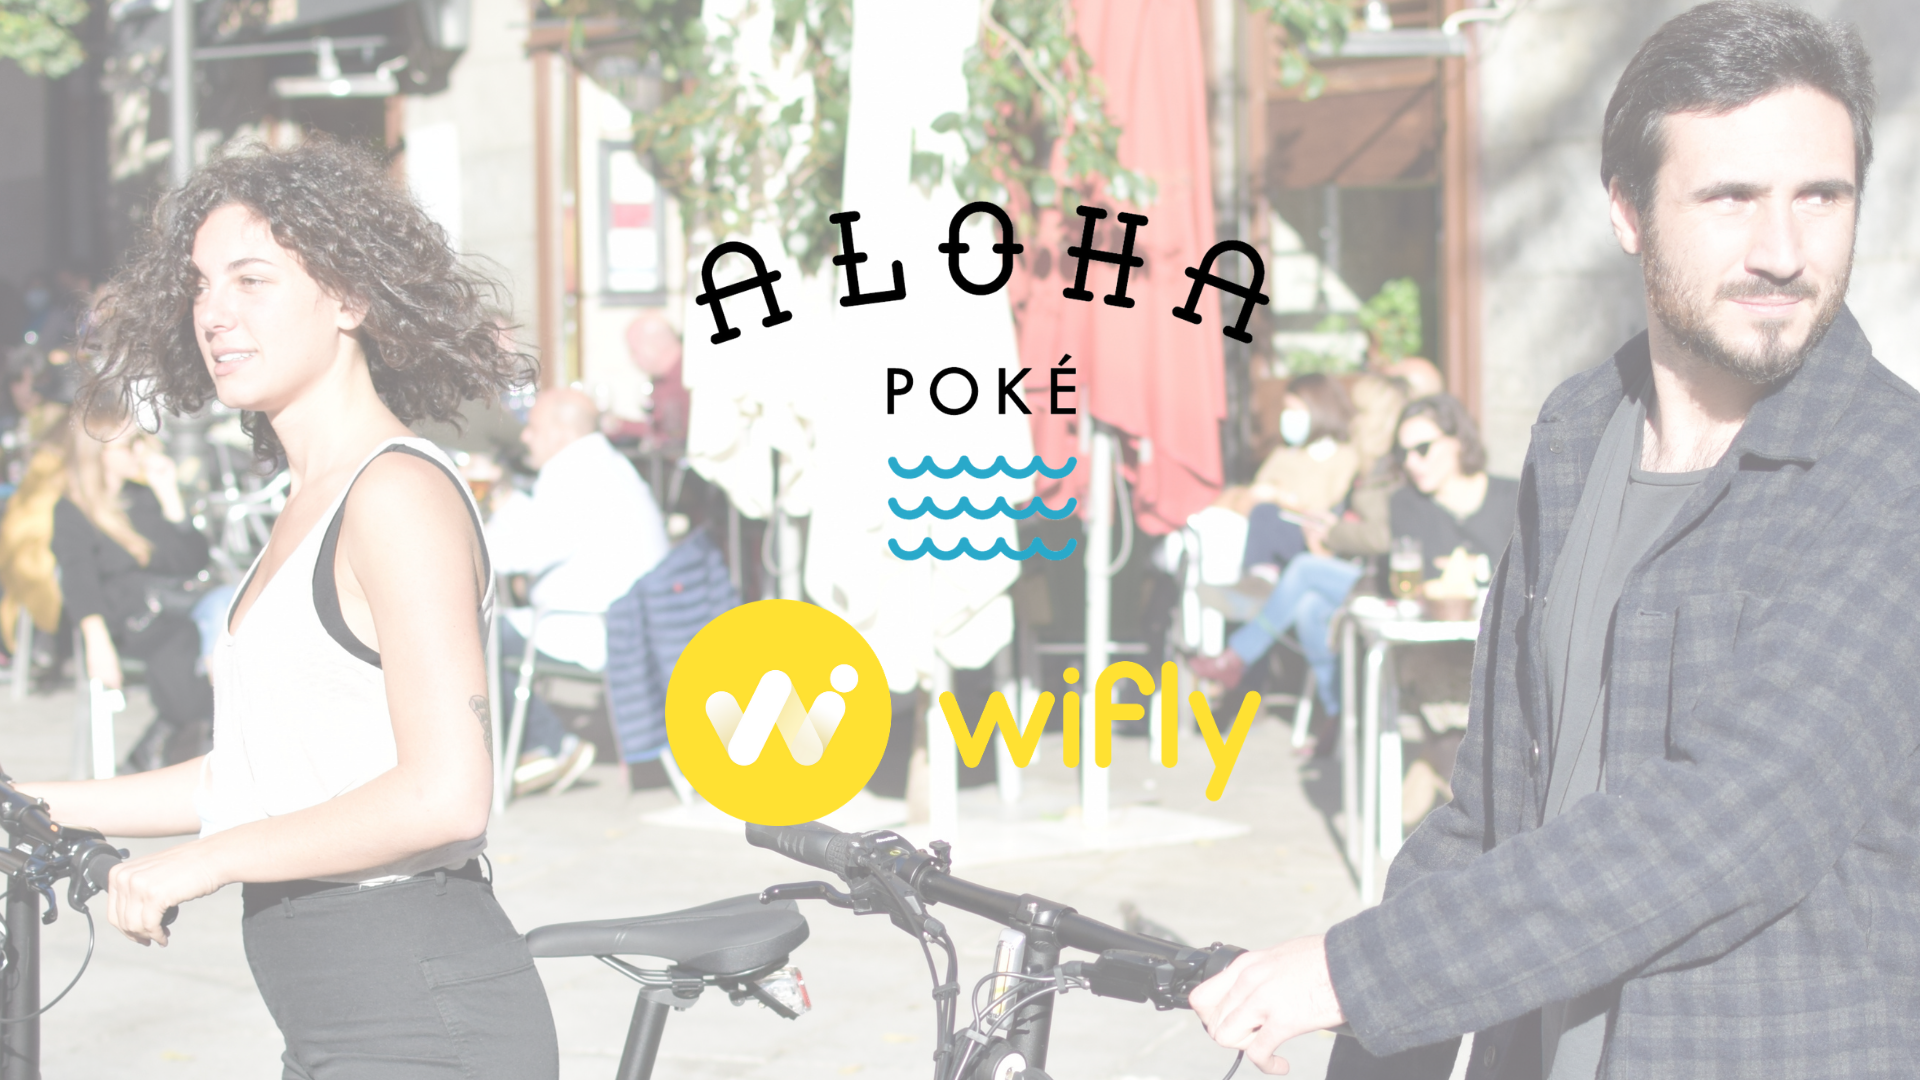 Logos-wifly-aloha-poke